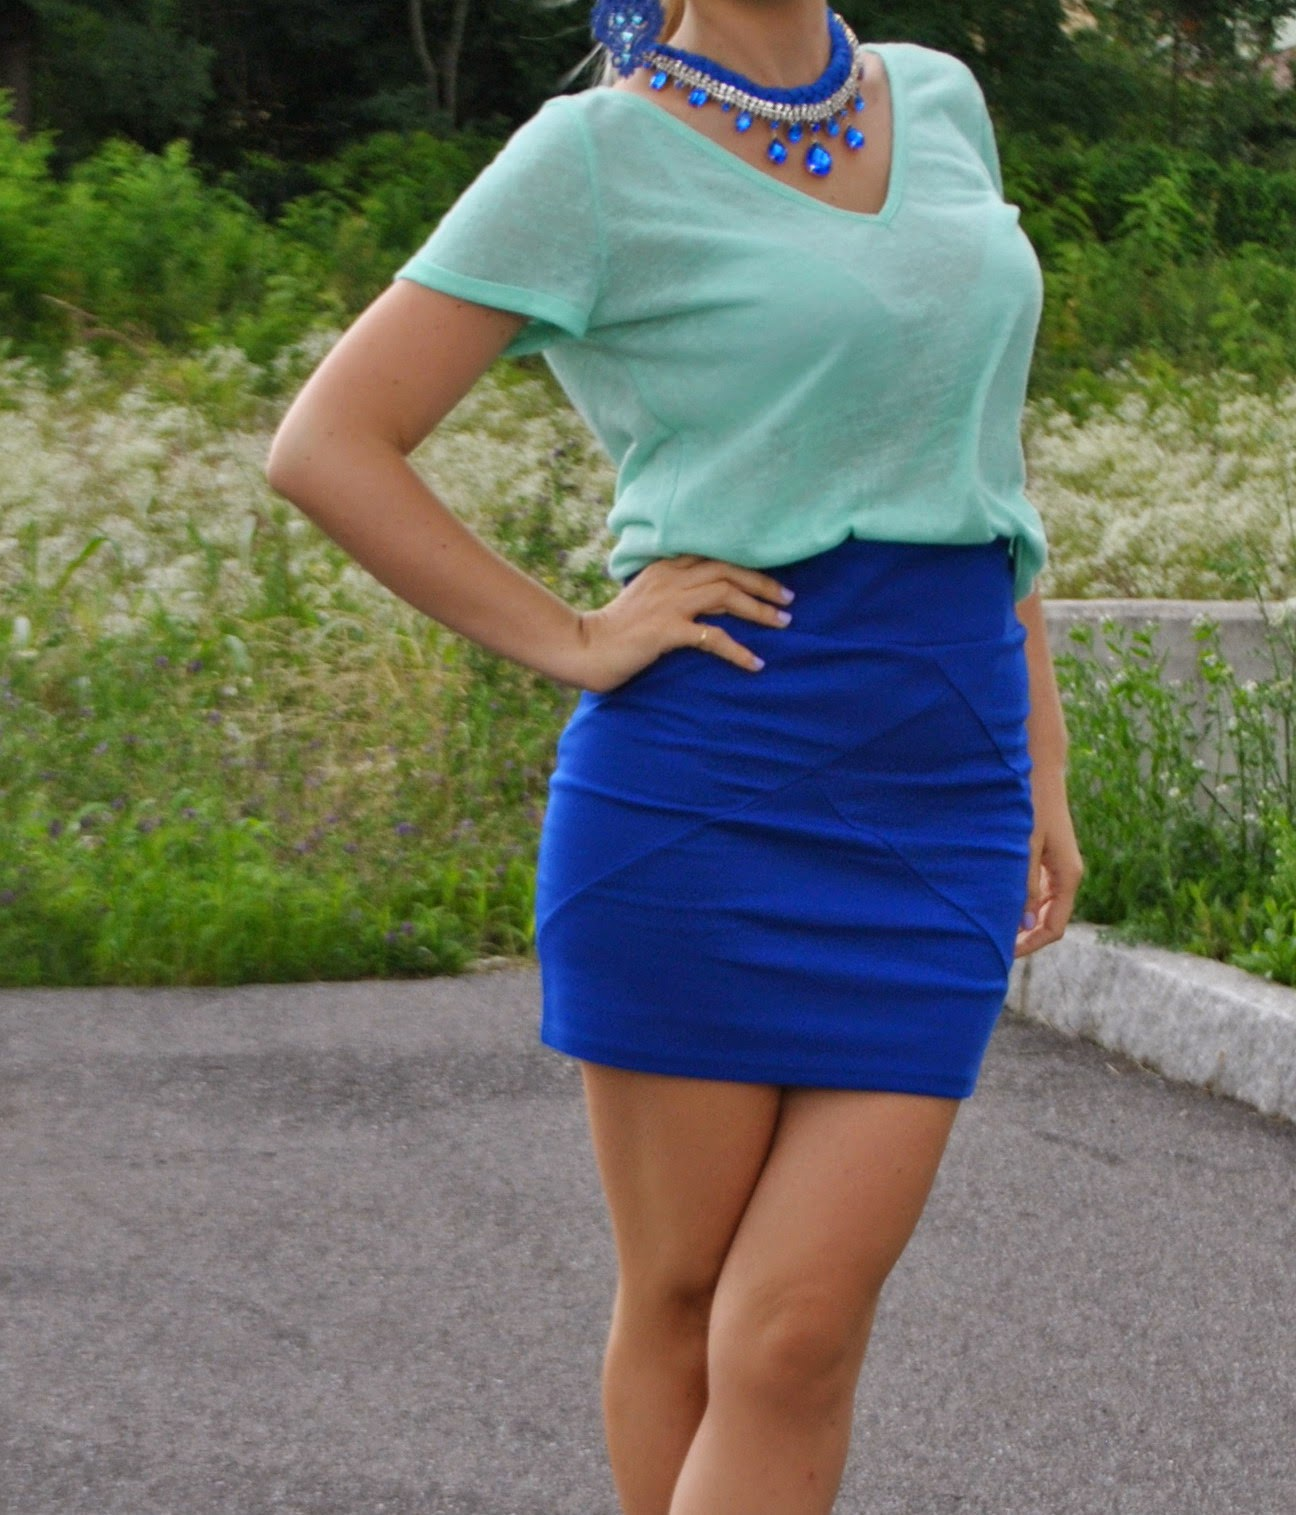 outfit blu e verde acqua outfit gonna elasticizzata blu e tshirt verde acqua  fblogger lookbook streetstyle